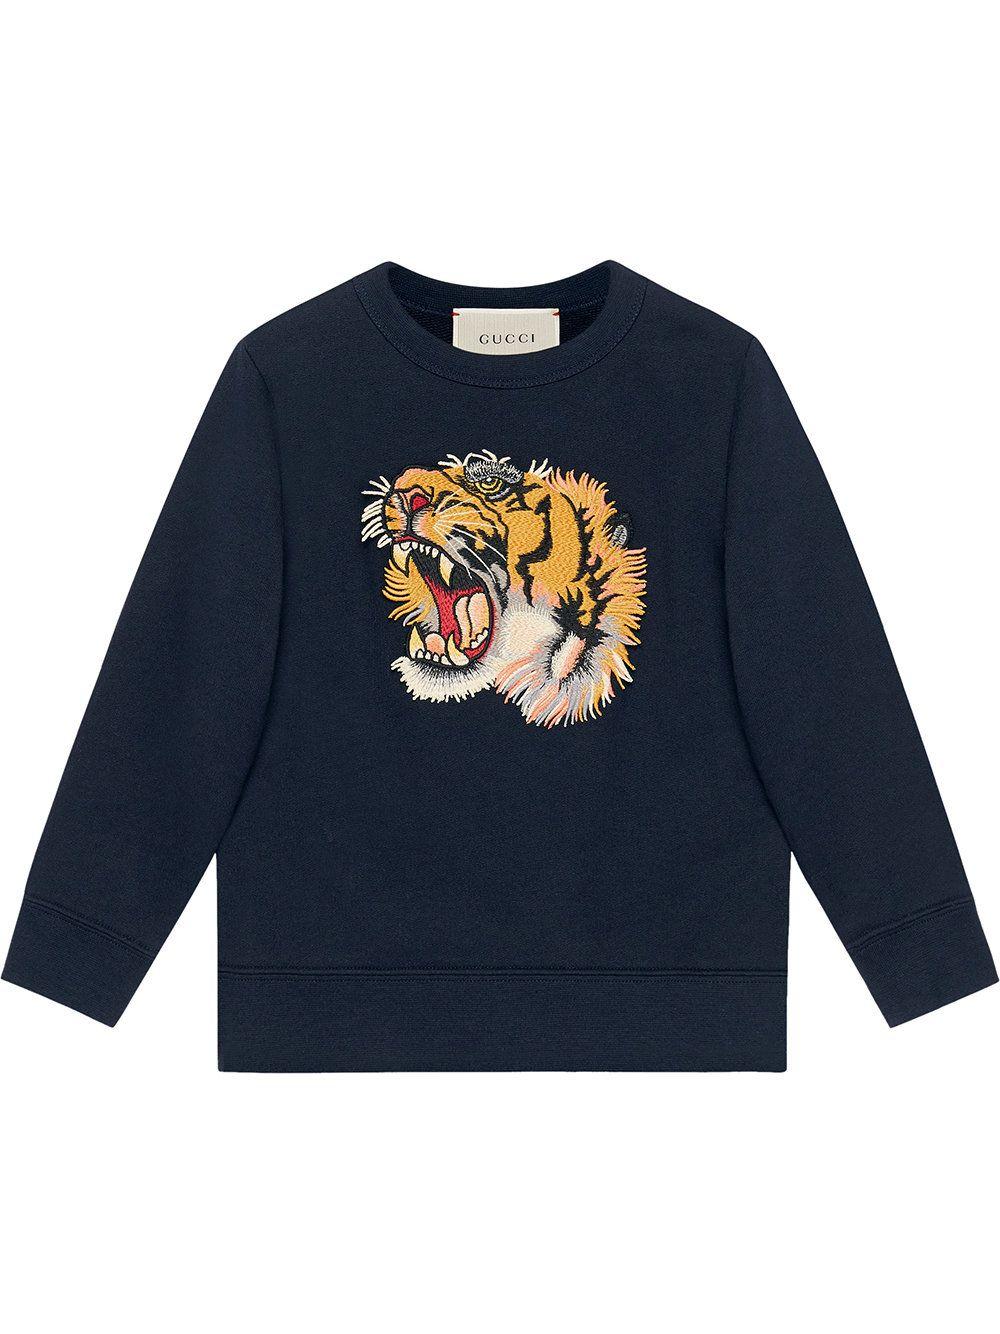 c7fa02b783 #gucci #kids #tiger #jumper #sweater #sweatshirt #kidswear #sporty #style  www.jofre.eu